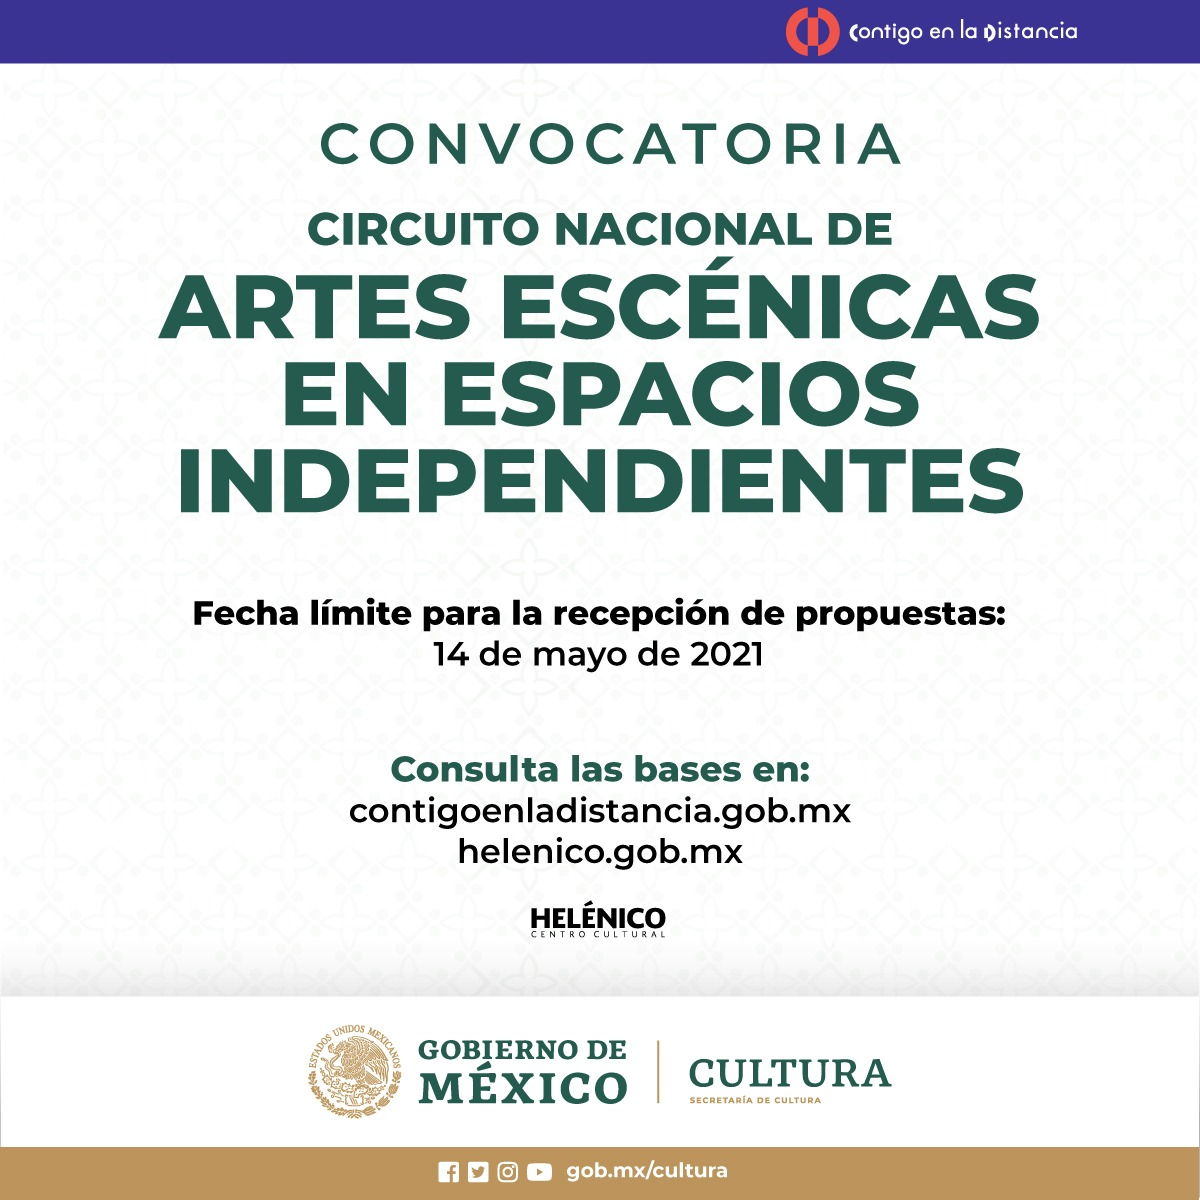 Abren convocatoria: Circuito Nacional de Artes Escénicas en Espacios Independientes